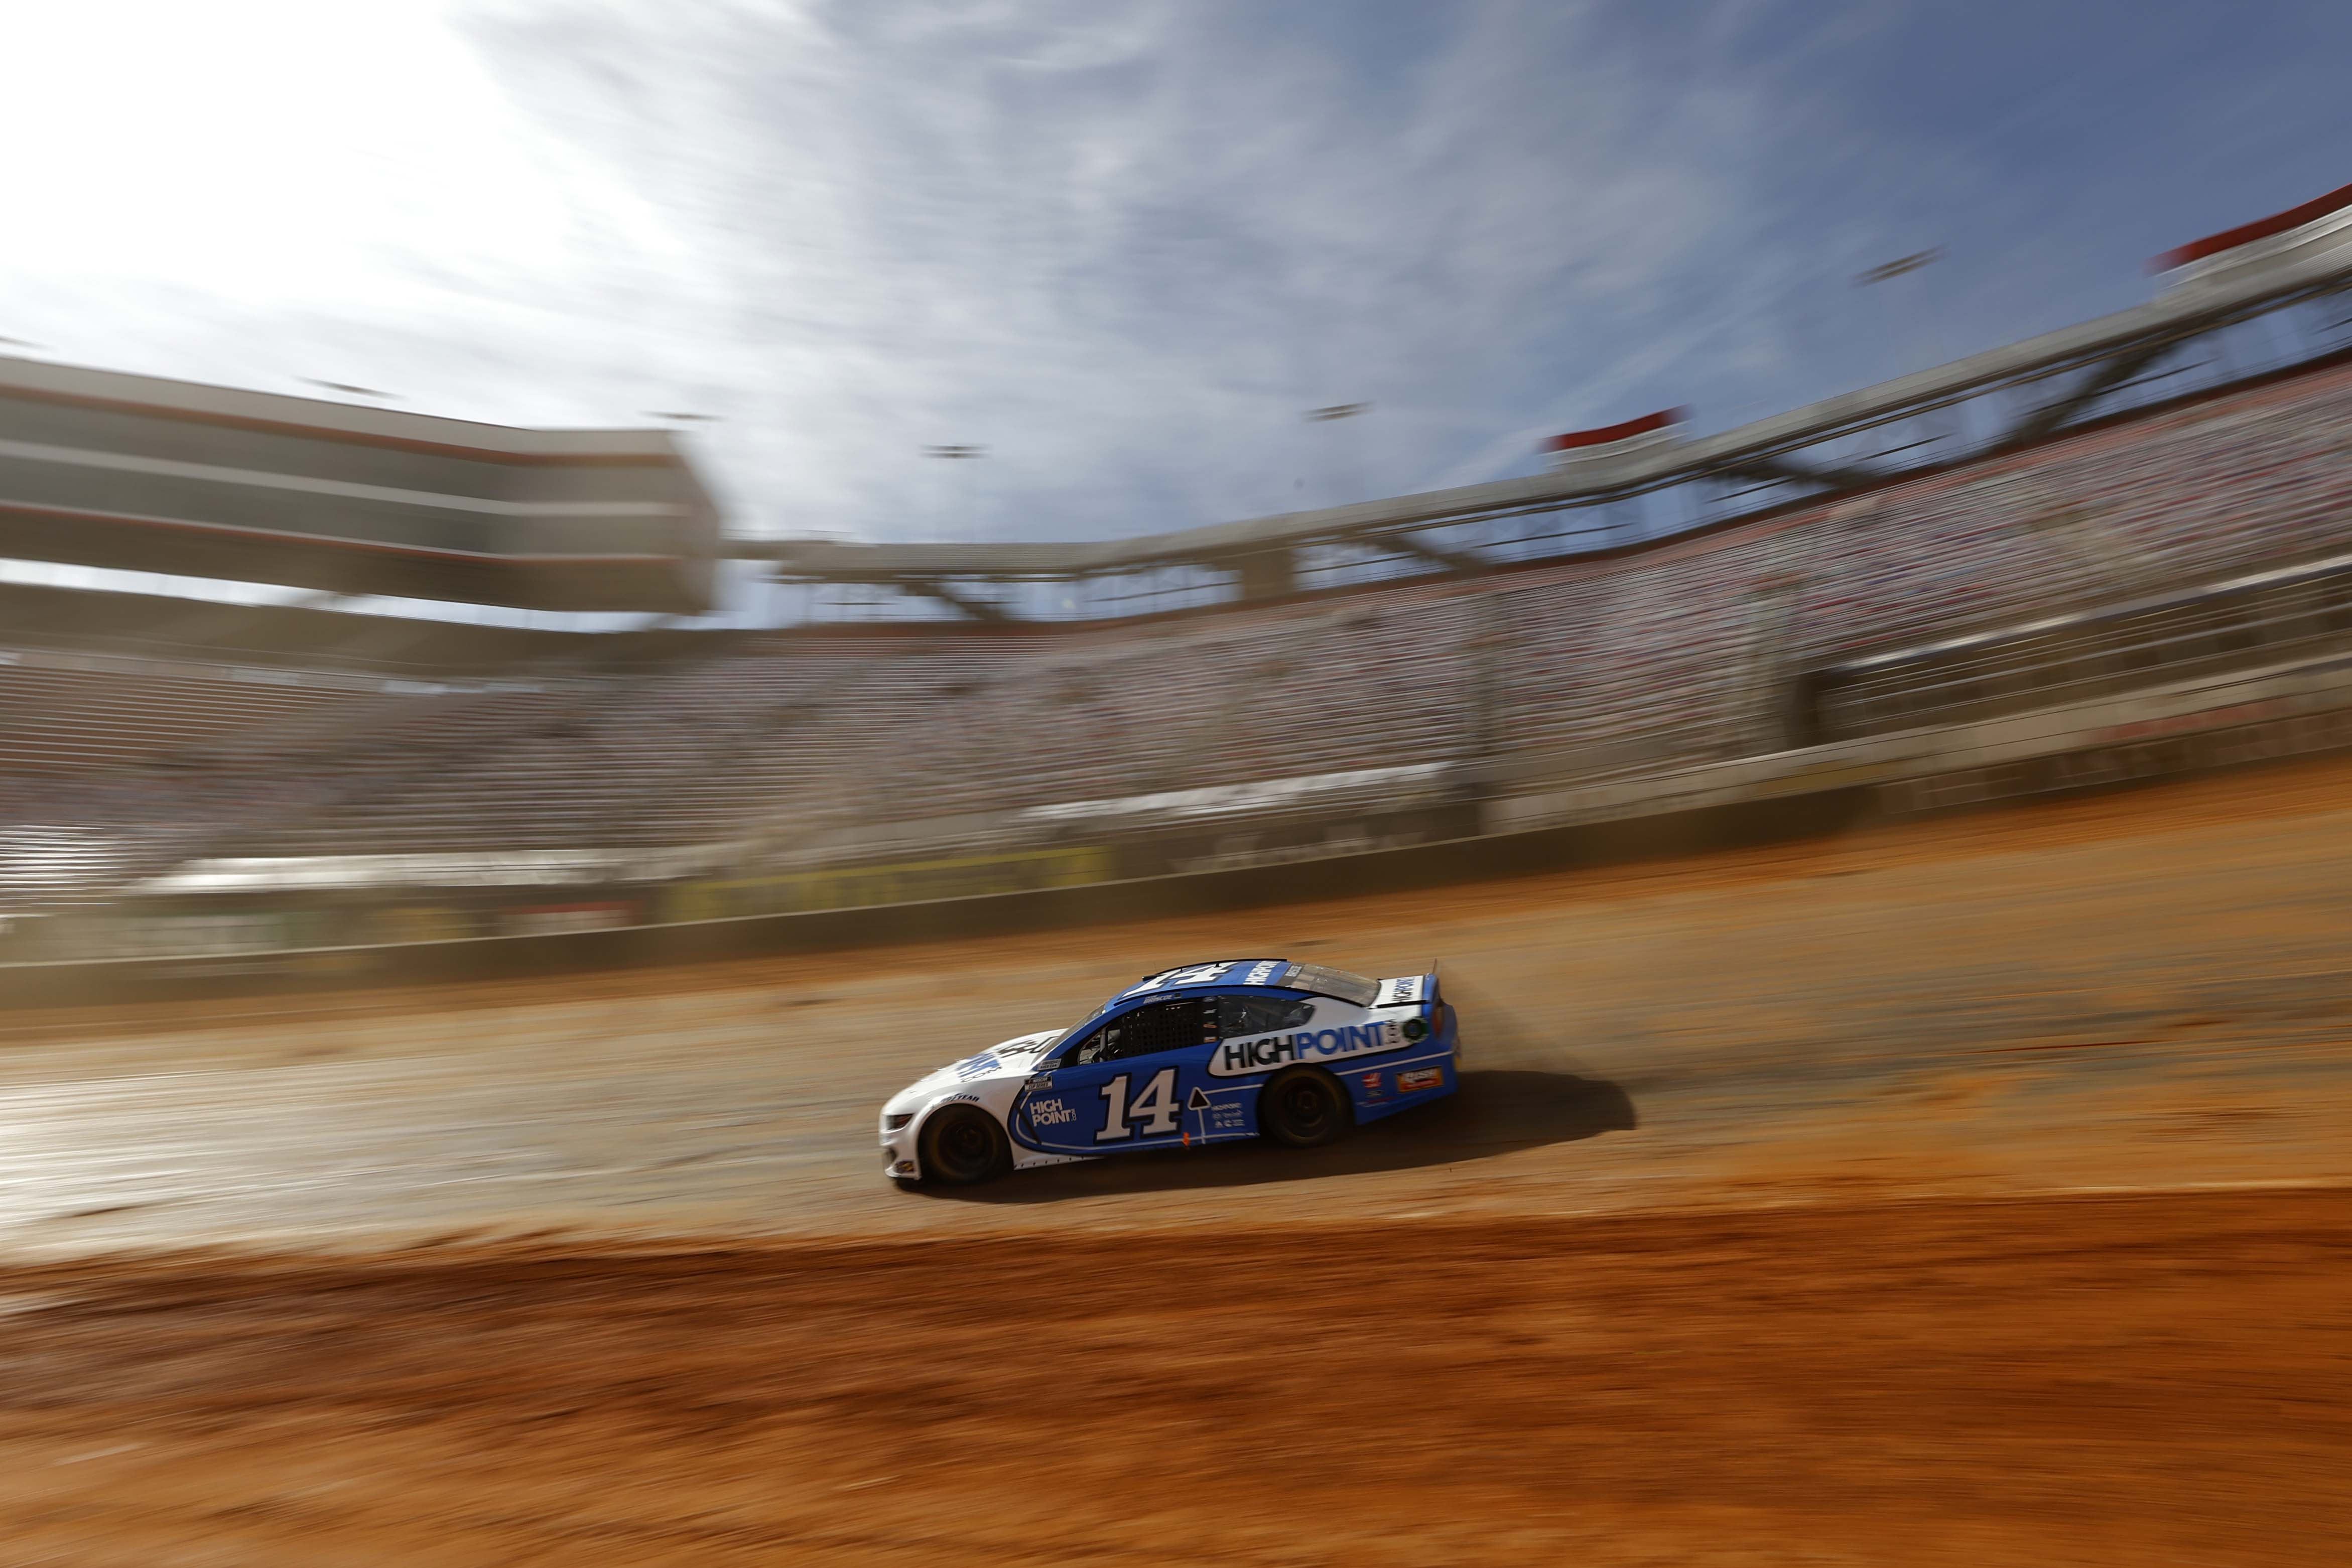 Chase Briscoe - Bristol Dirt Track - NASCAR Cup Series